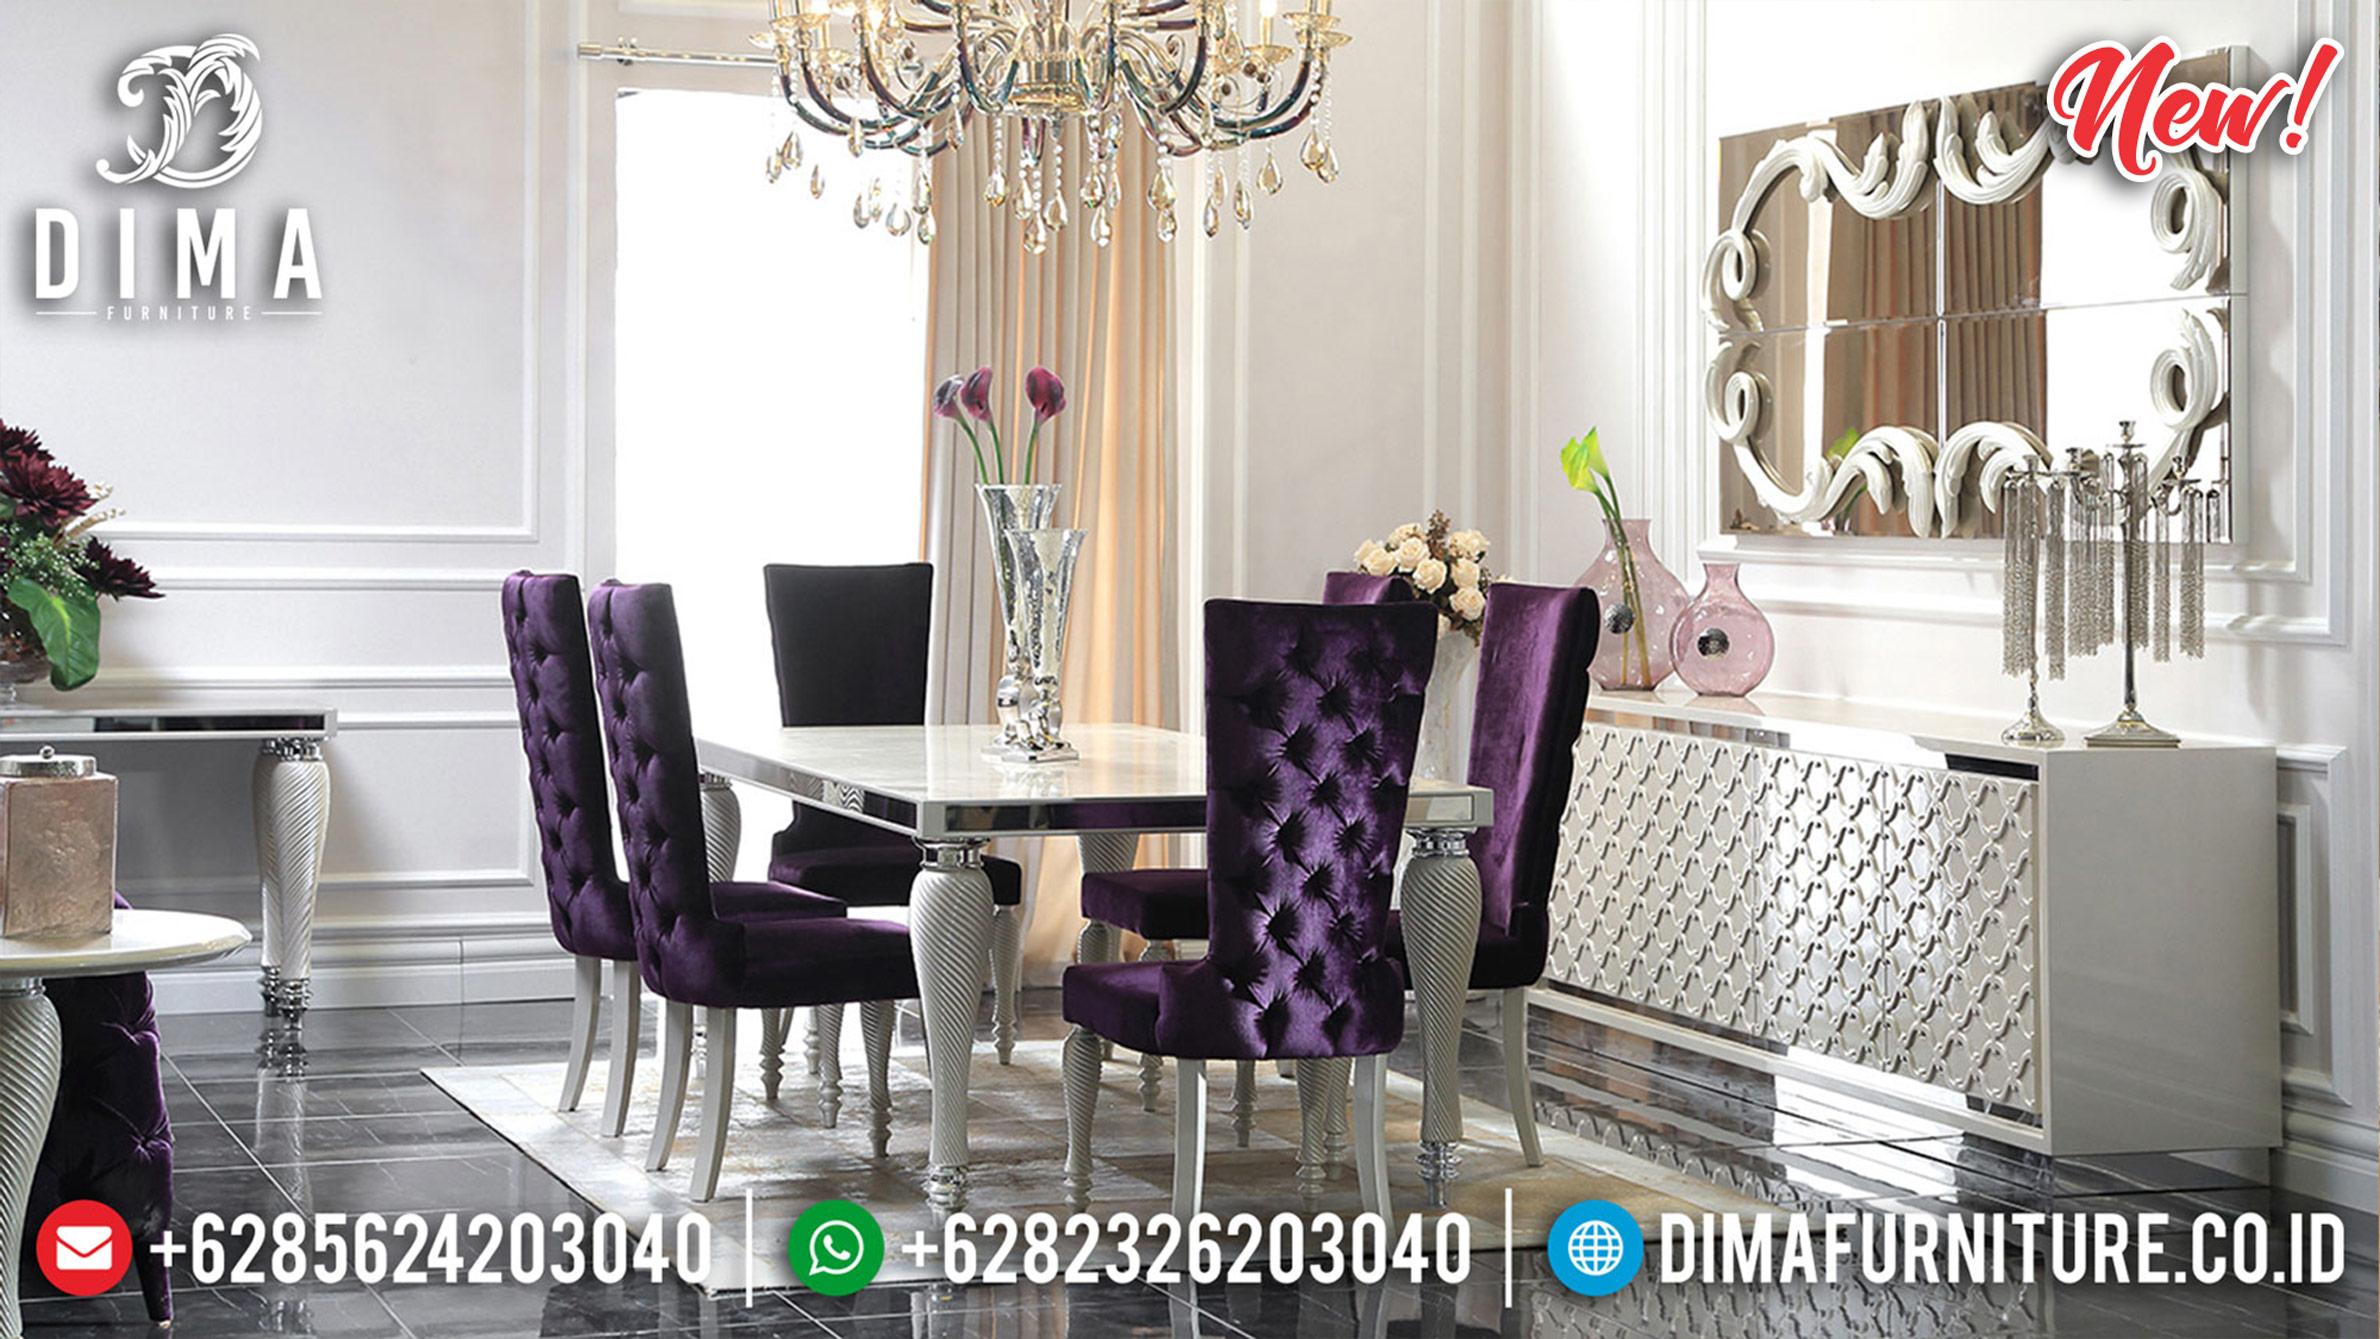 Jual Set Meja Makan Mewah Minimalis Silver Shine Color Luxurious Furniture Jepara ST-1167